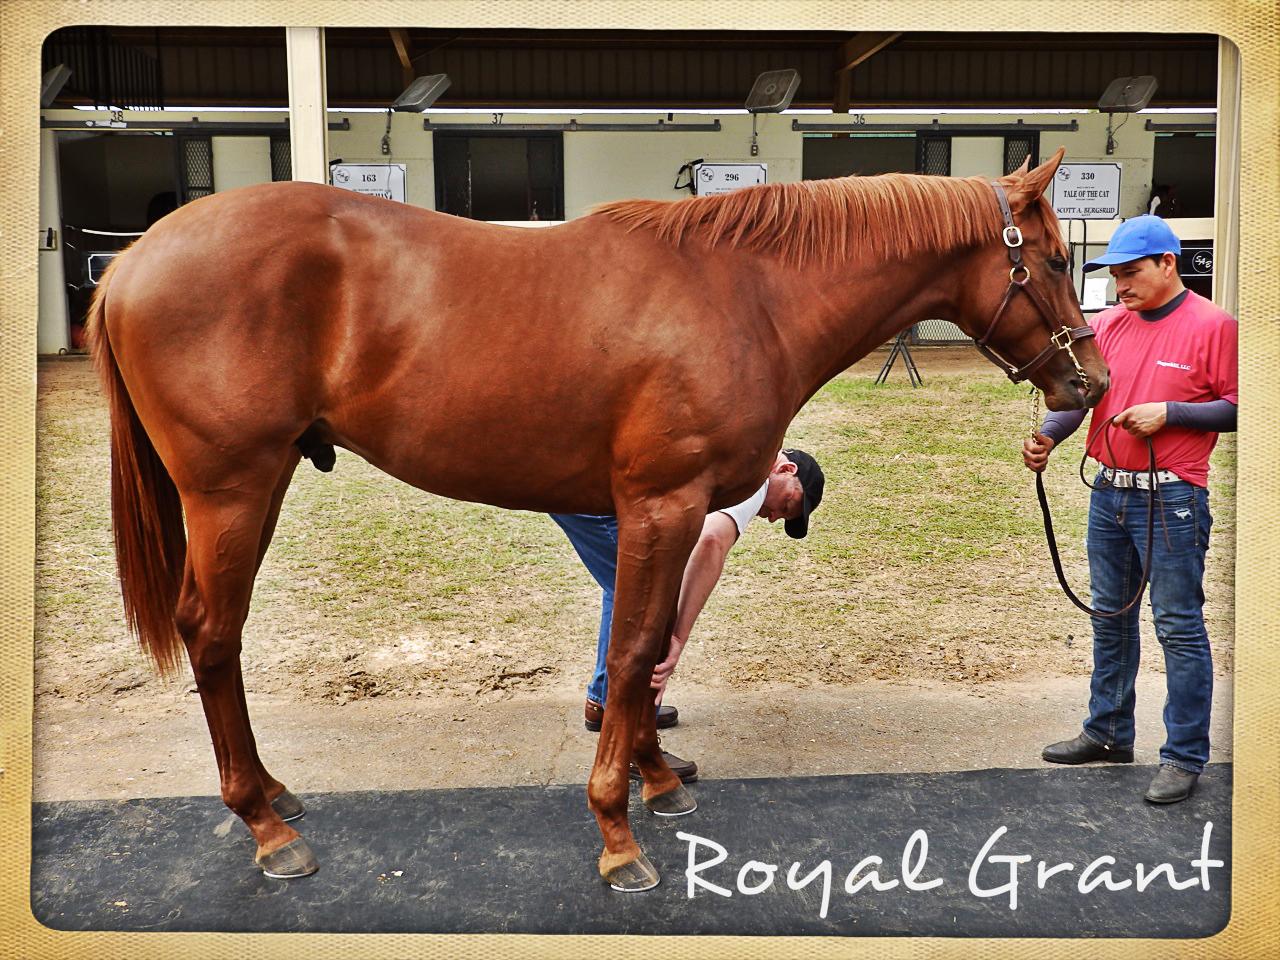 Royal Grant